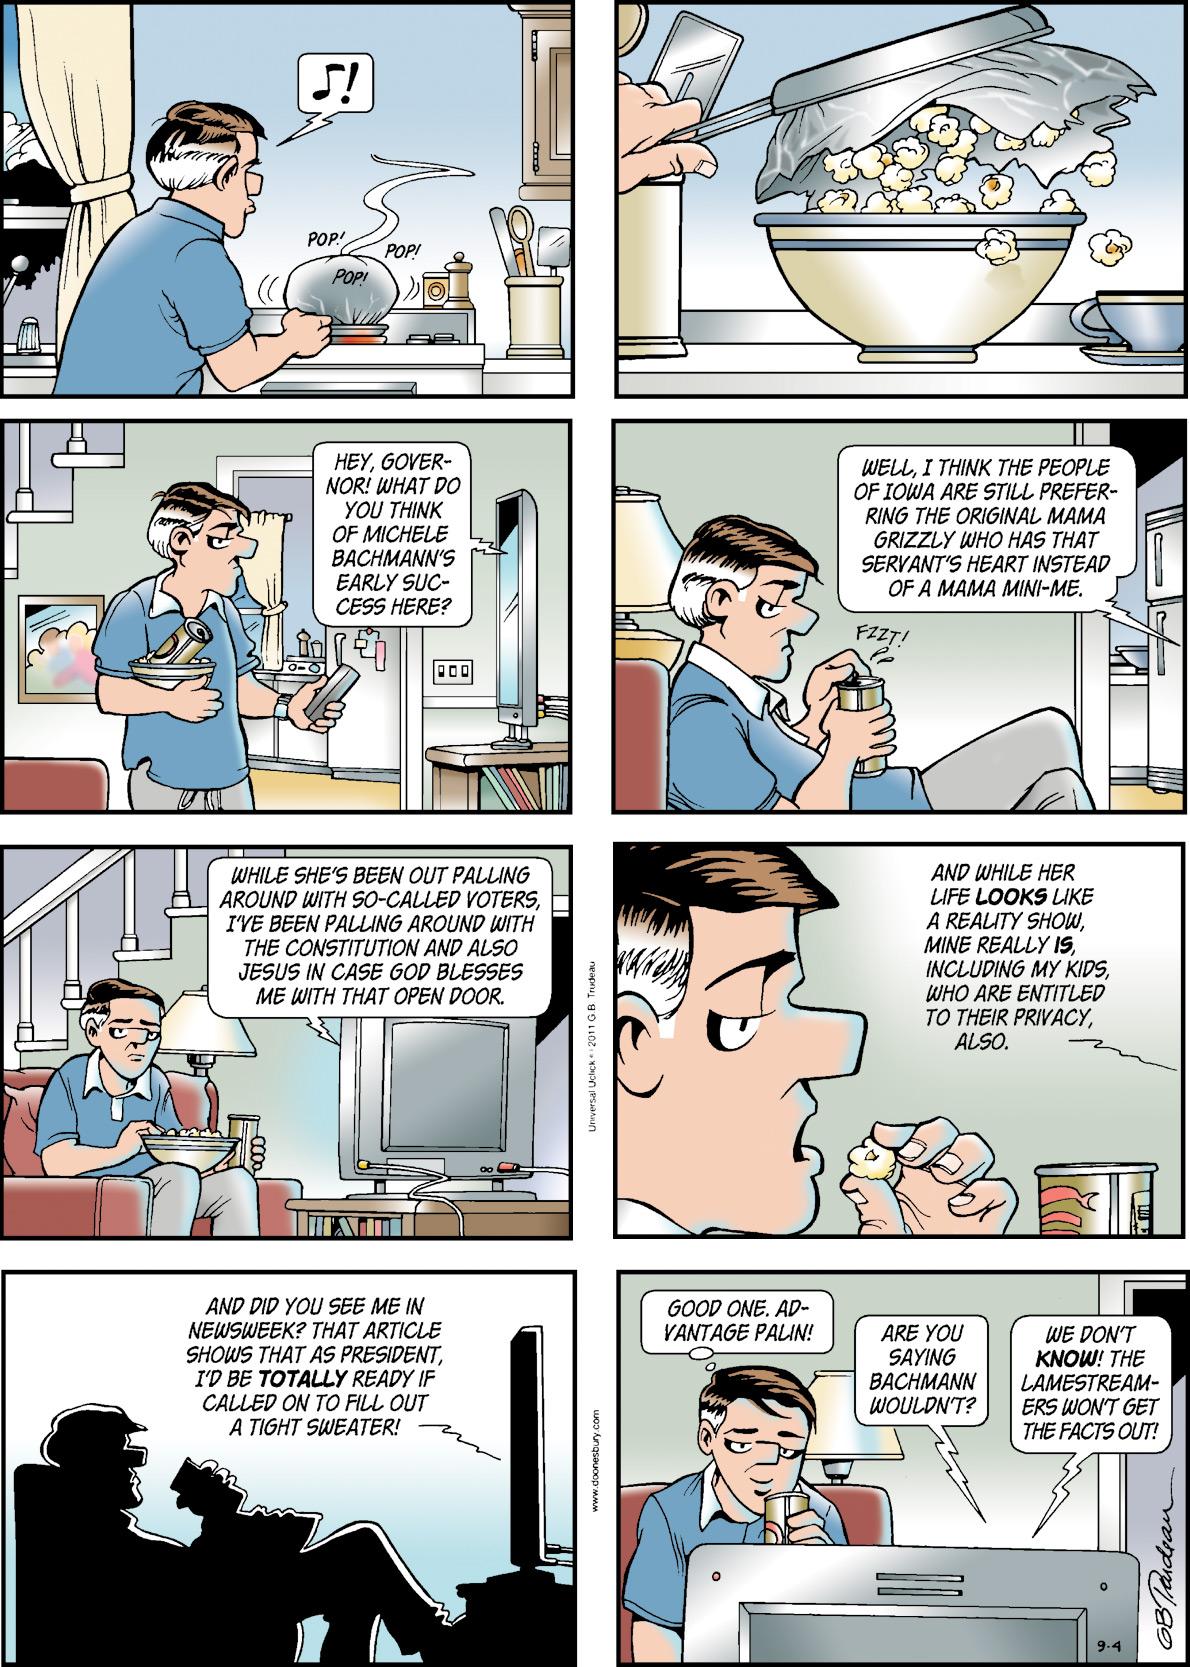 Doonesbury for Sep 4, 2011 Comic Strip